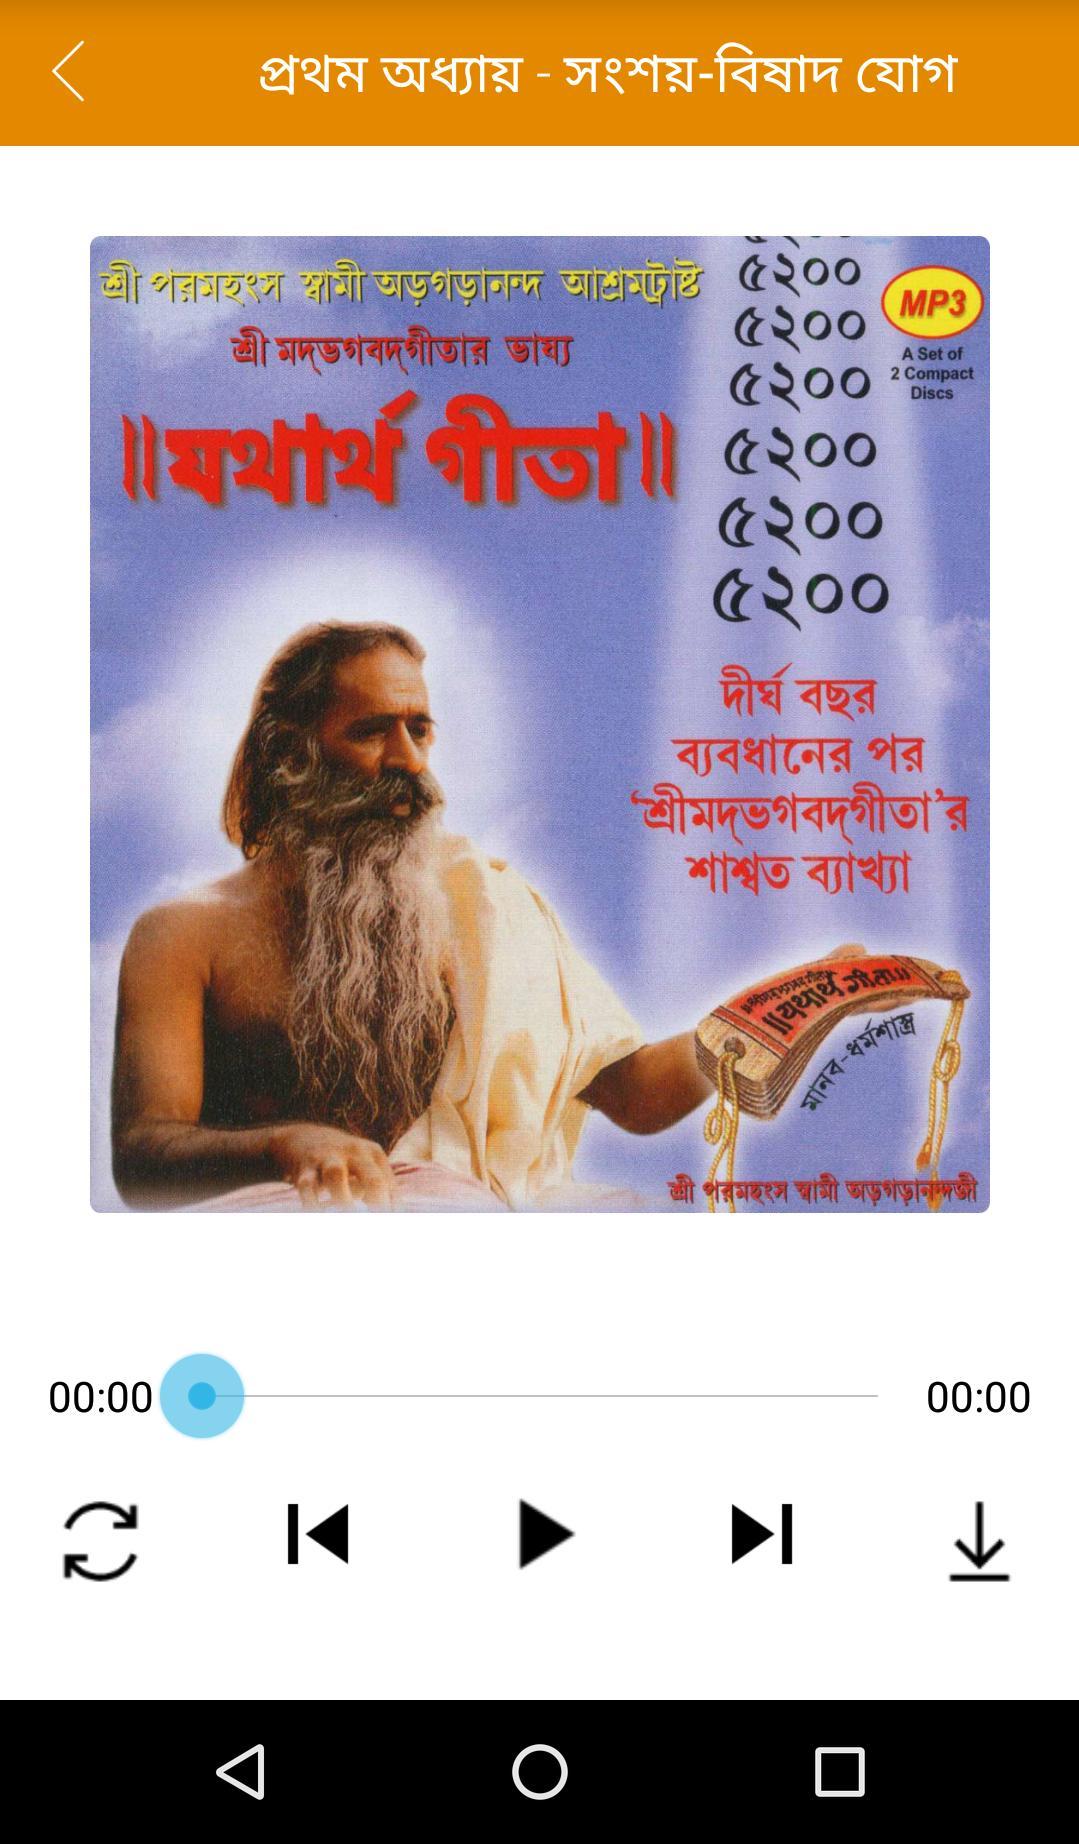 Yatharth Geeta (Bengali) - Srimad Bhagavad Gita for Android